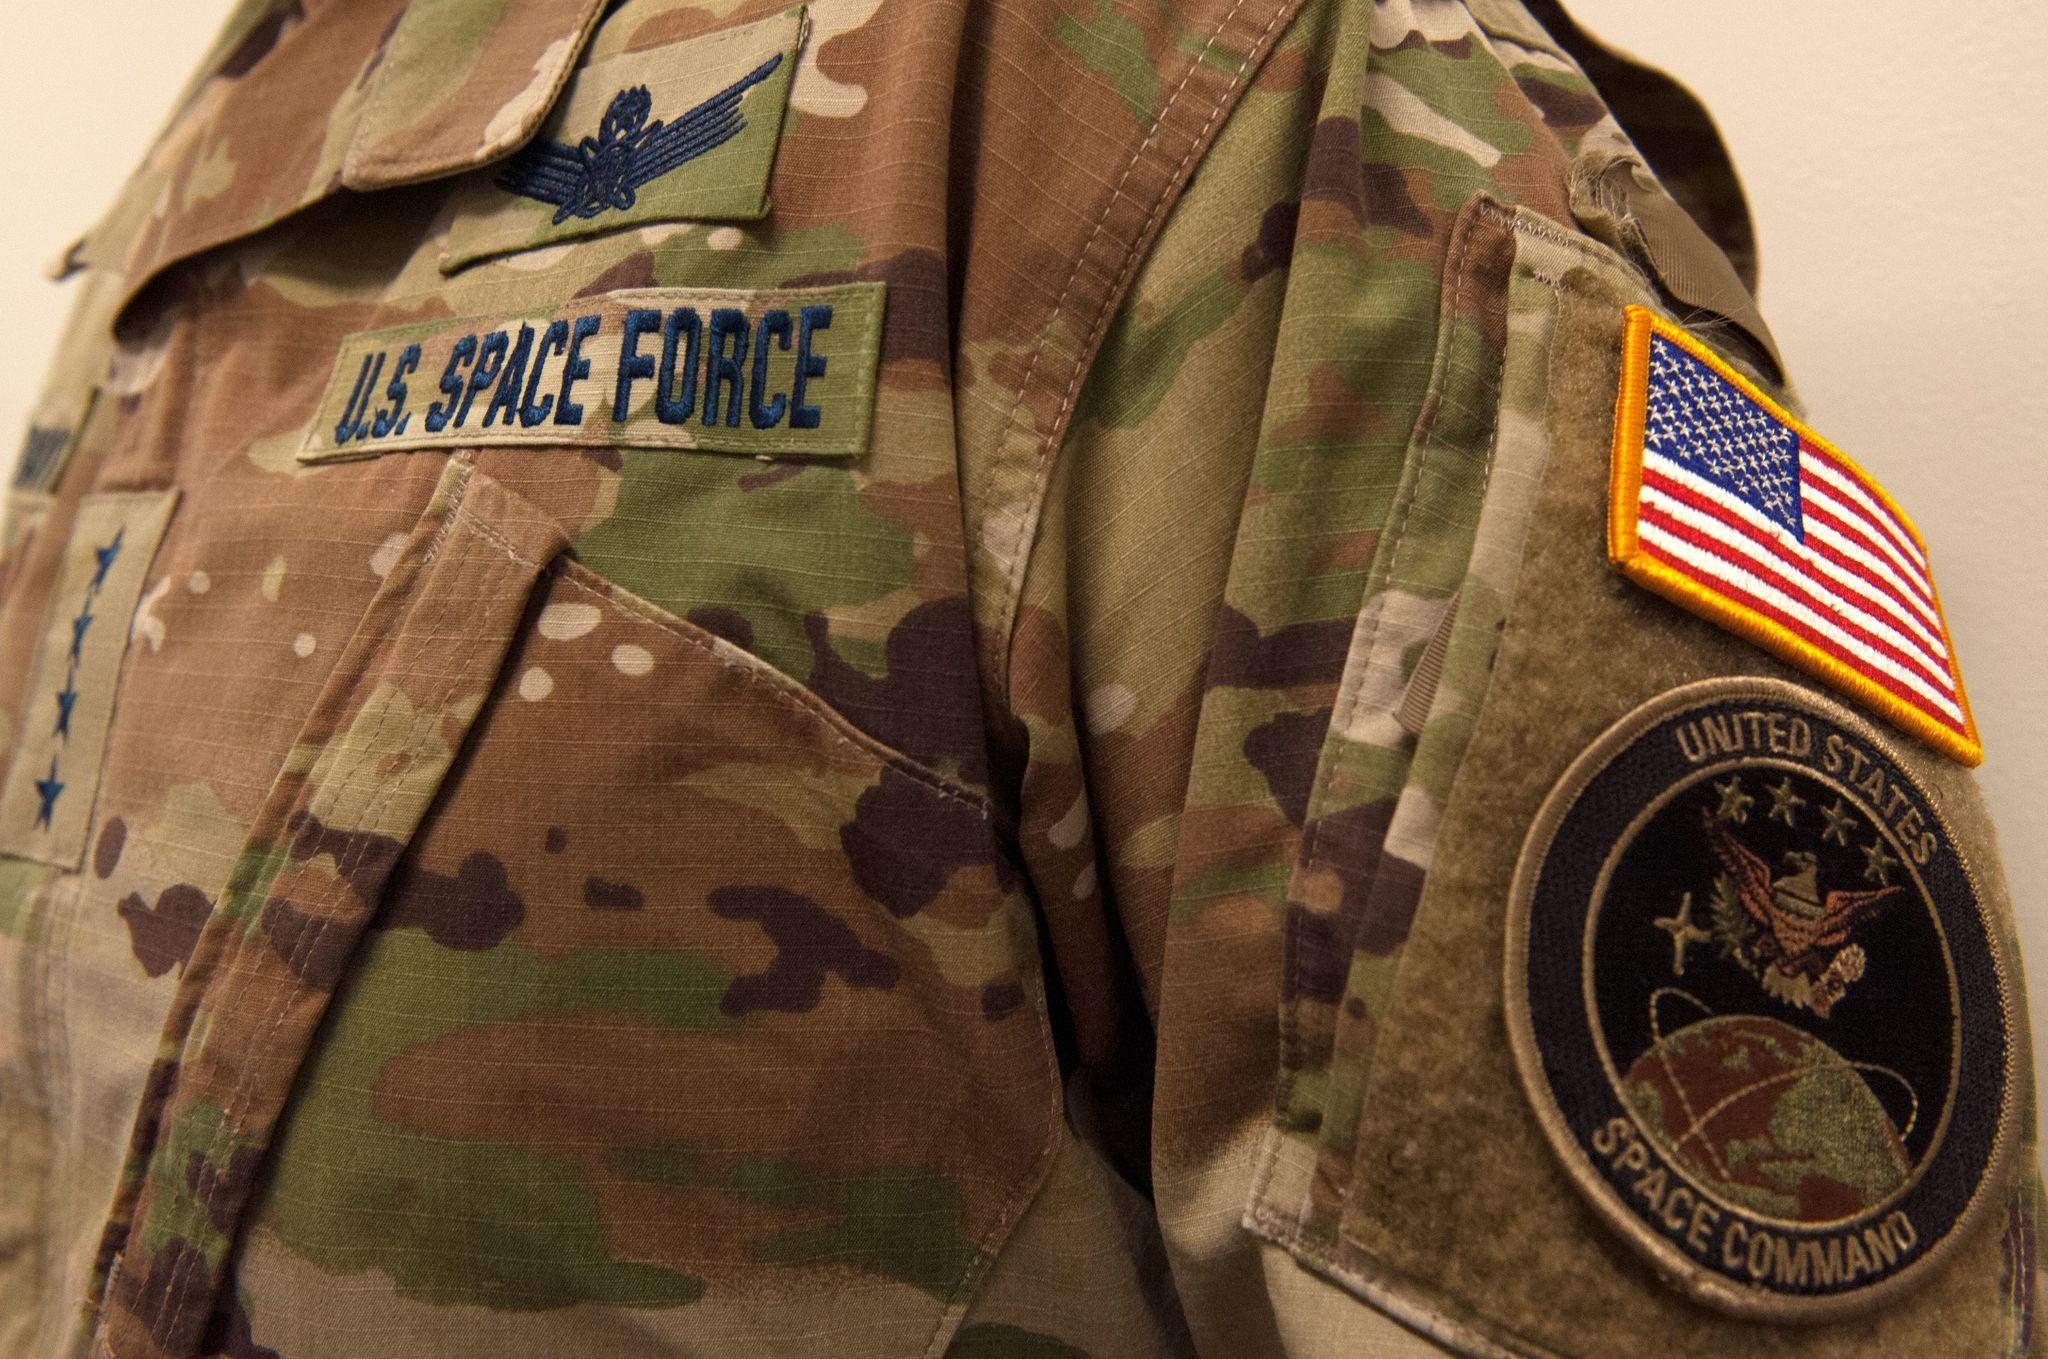 Camouflage Space Force uniforms raise questions, ridicule